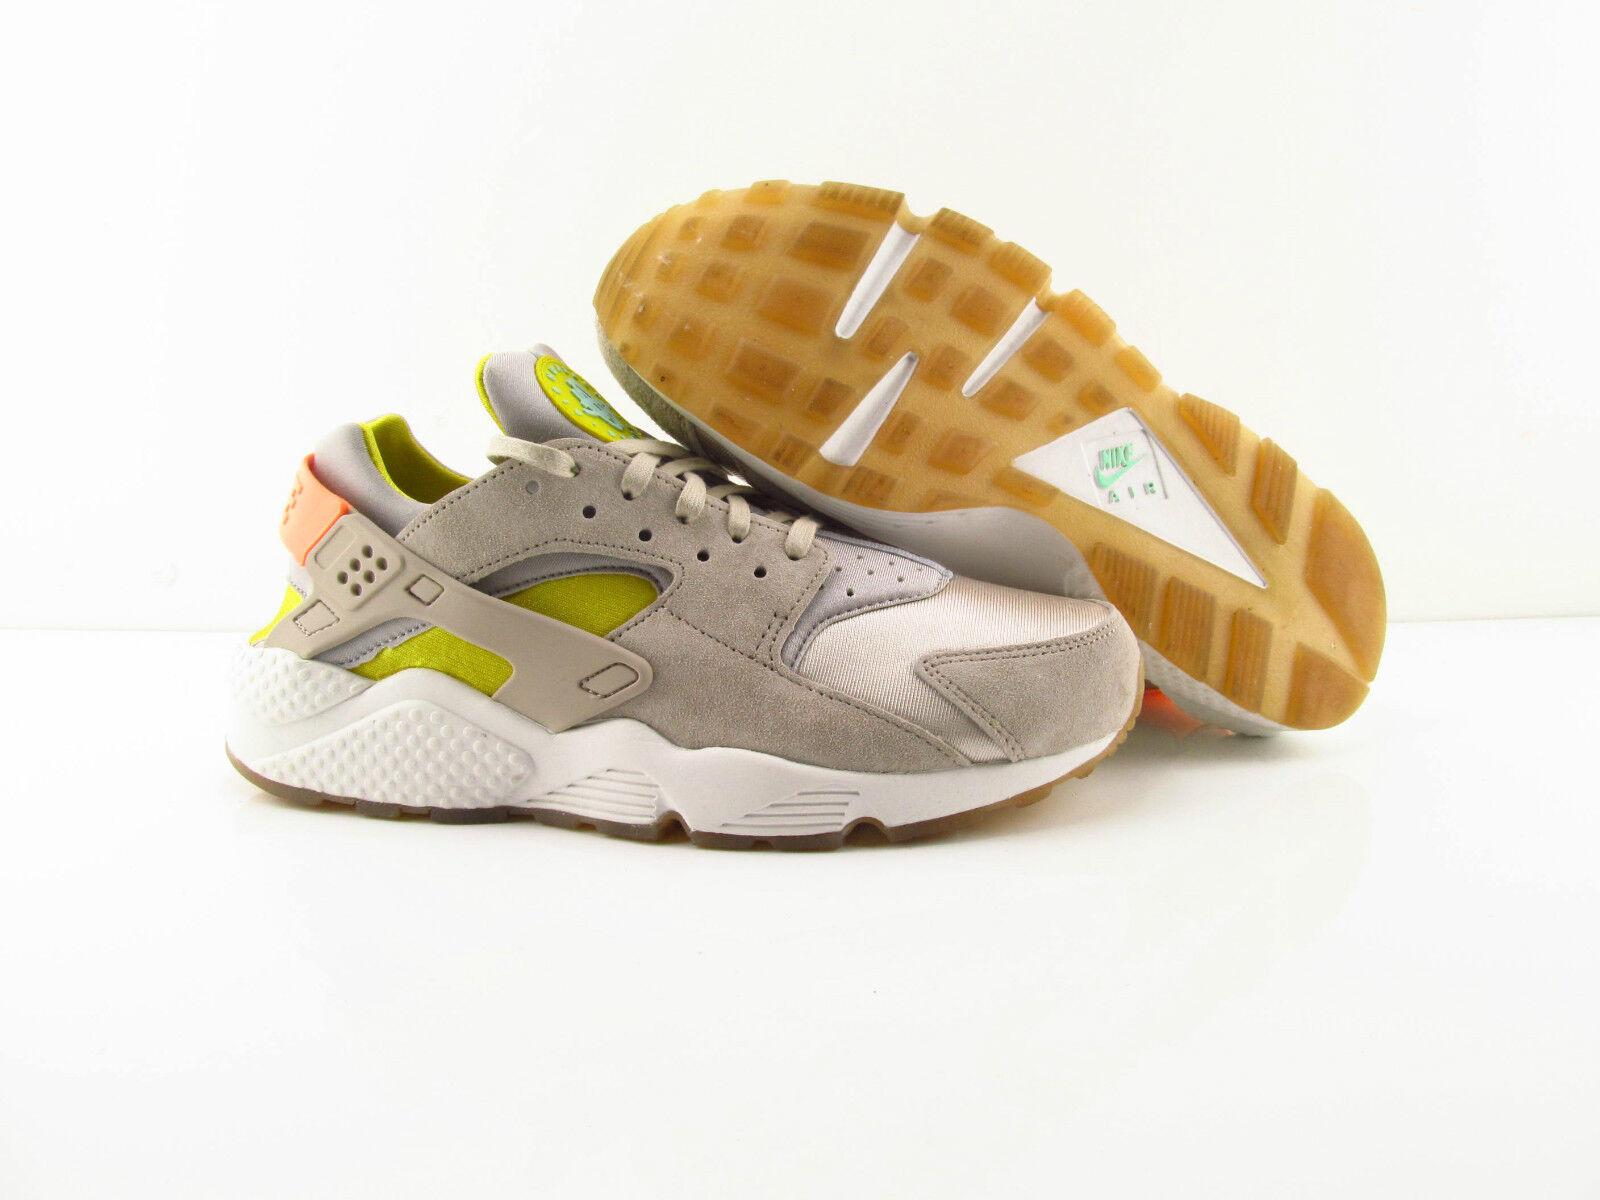 Nike Air Huarache  LA Glow  Running Turnschuhe Rare  US_10.5 EU 42.5    | Abgabepreis